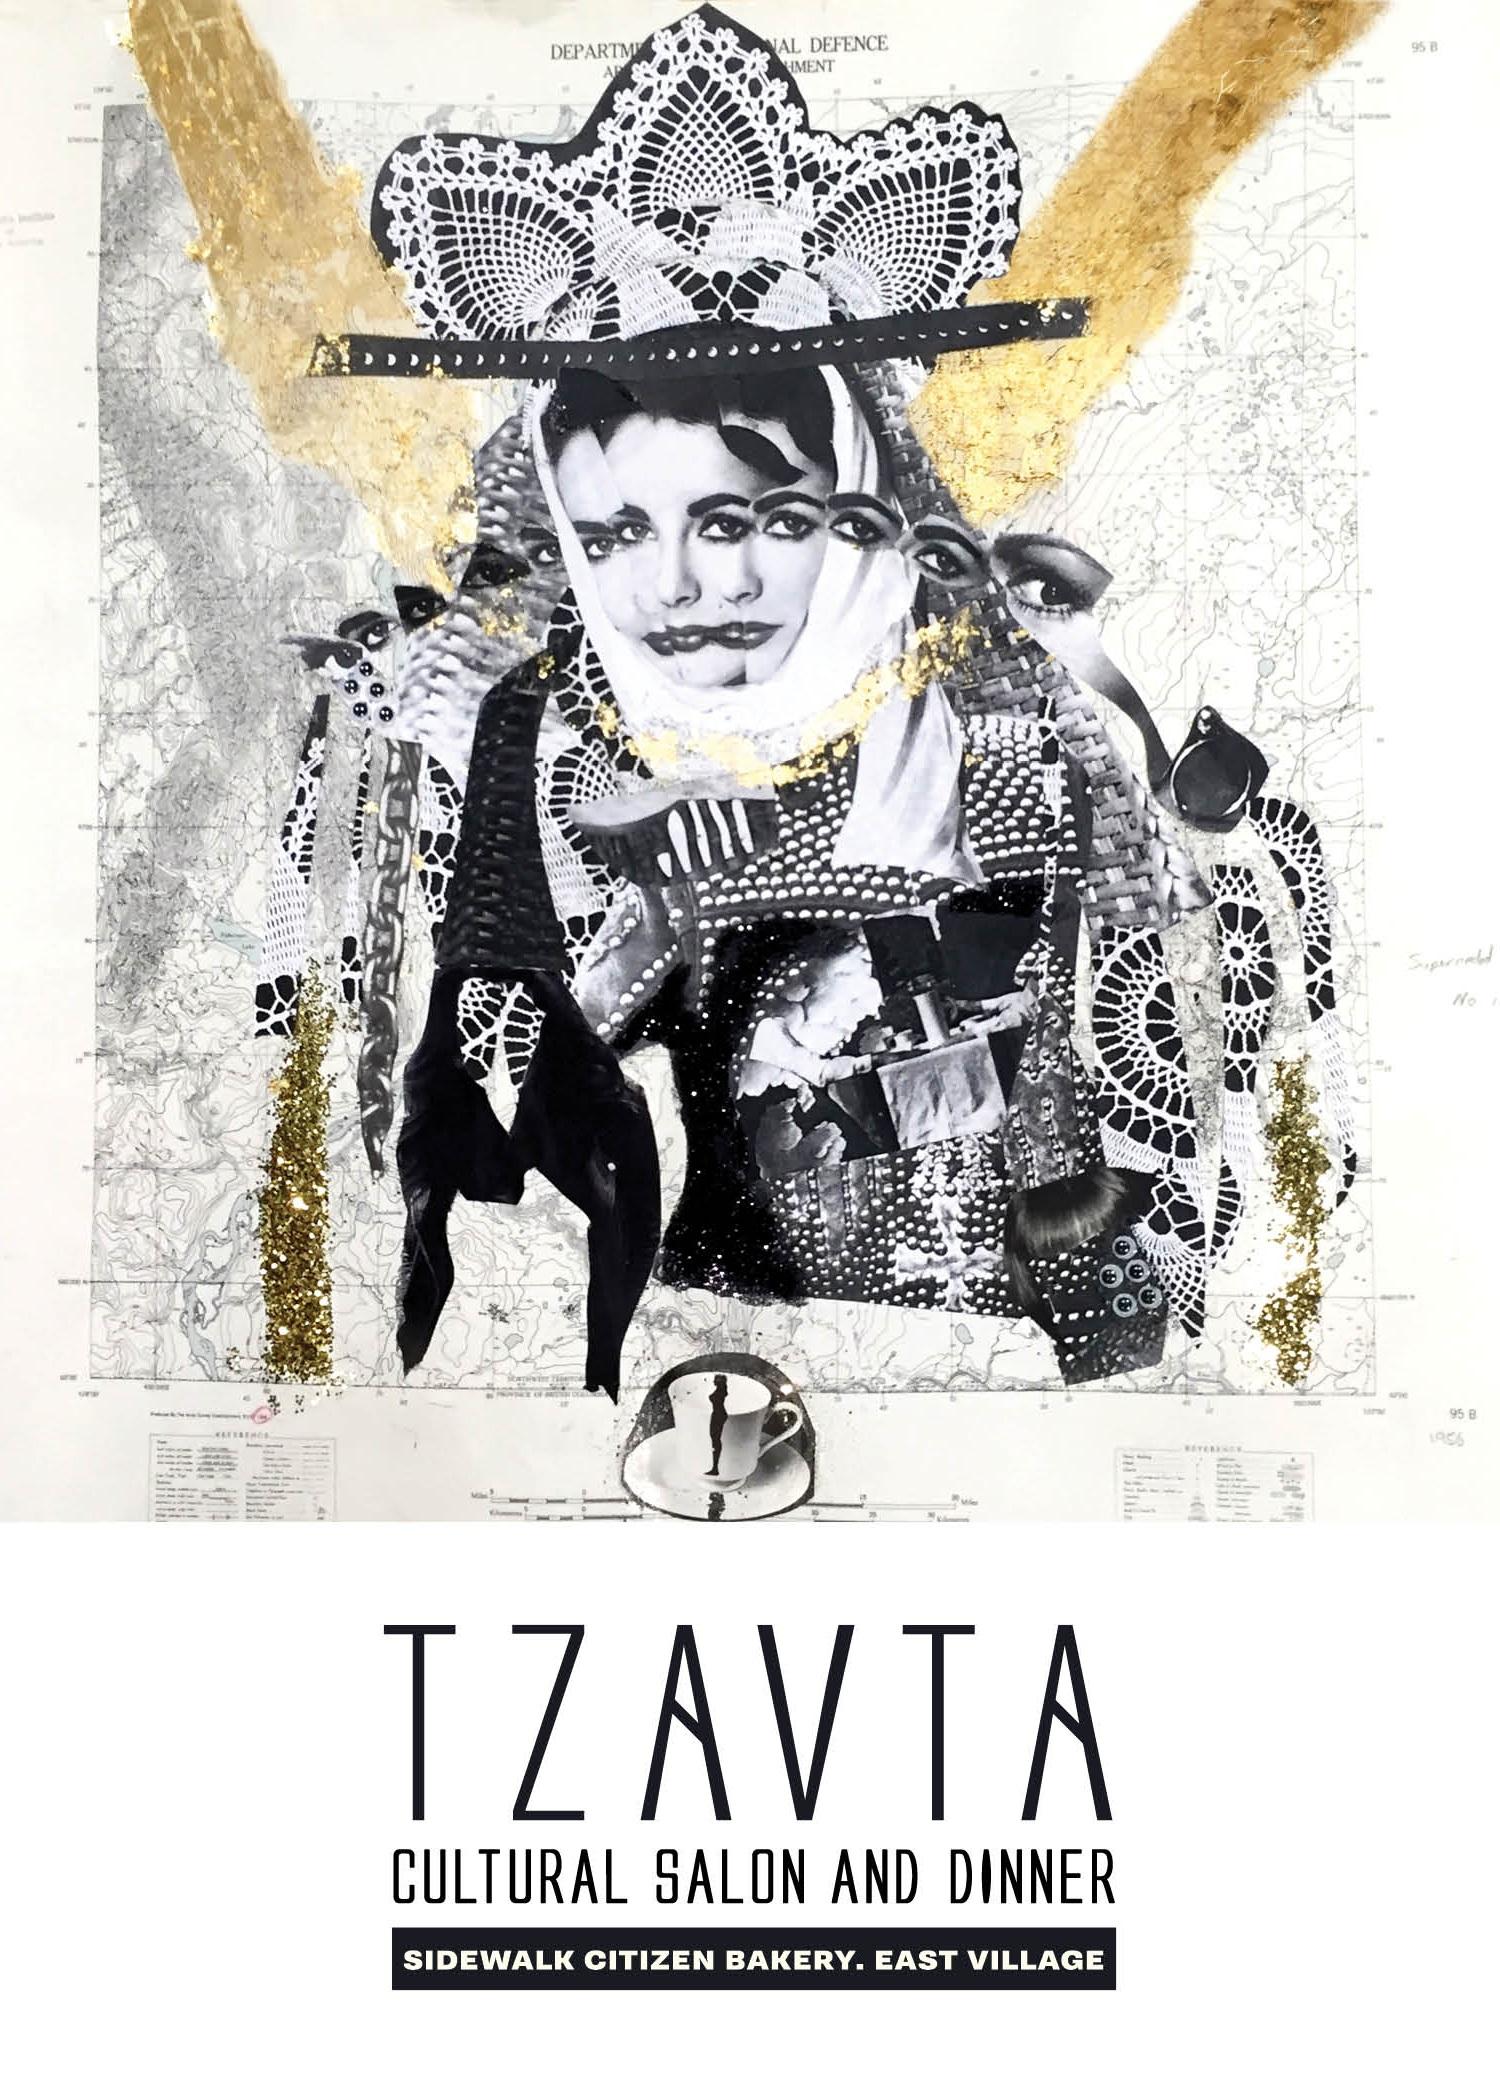 TZAVTA #4